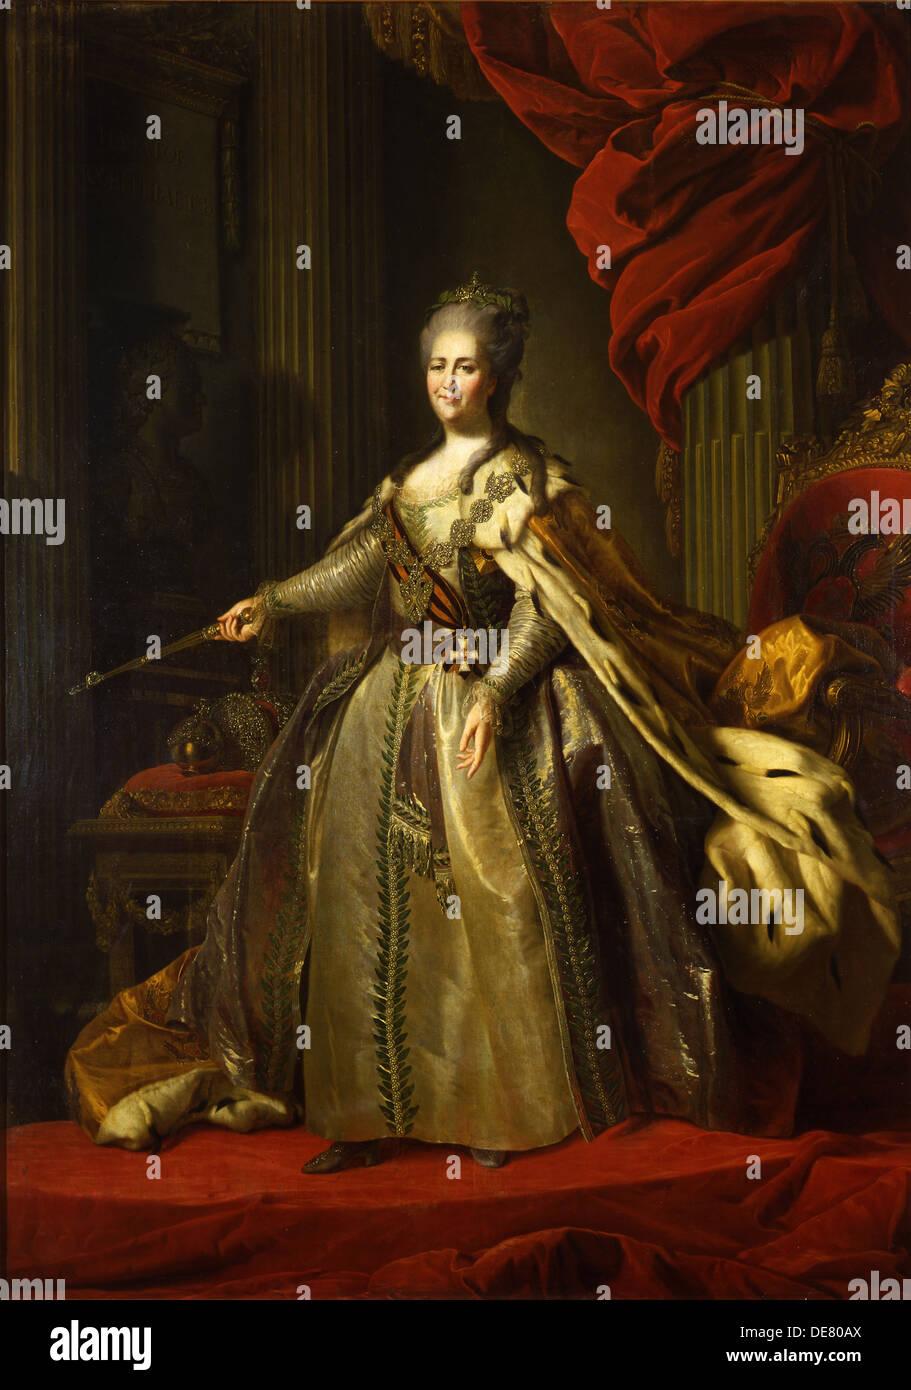 Portrait of Empress Catherine II (1729-1796), 1775-1780. Artist: Rokotov, Fyodor Stepanovich (1735-1808) - Stock Image